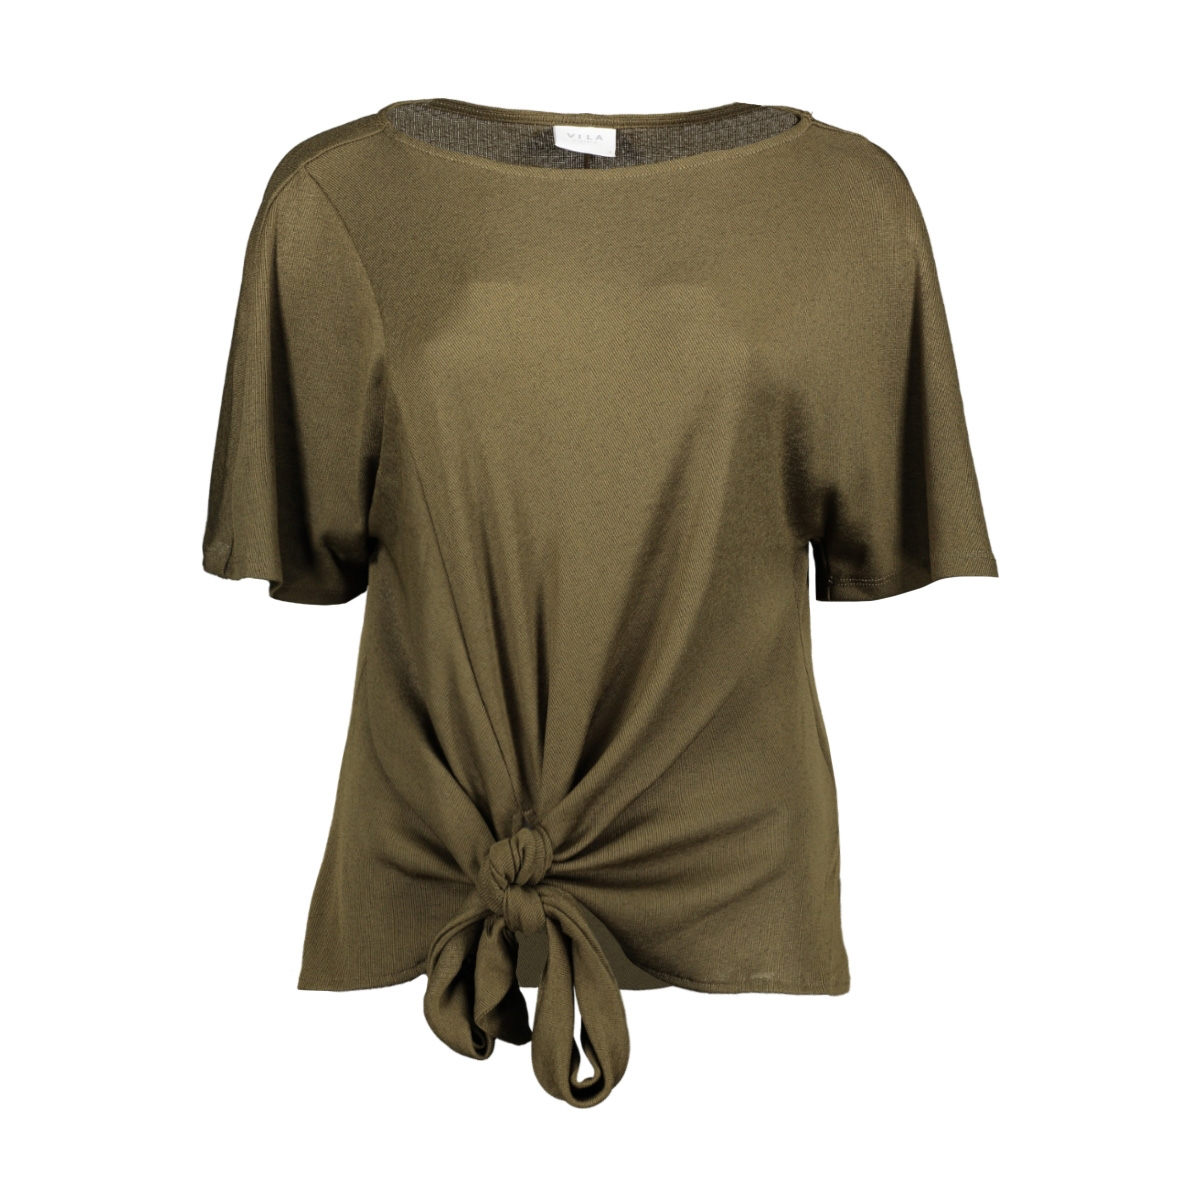 vinamina s/s t-shirt/1 14057193 vila t-shirt dark olive